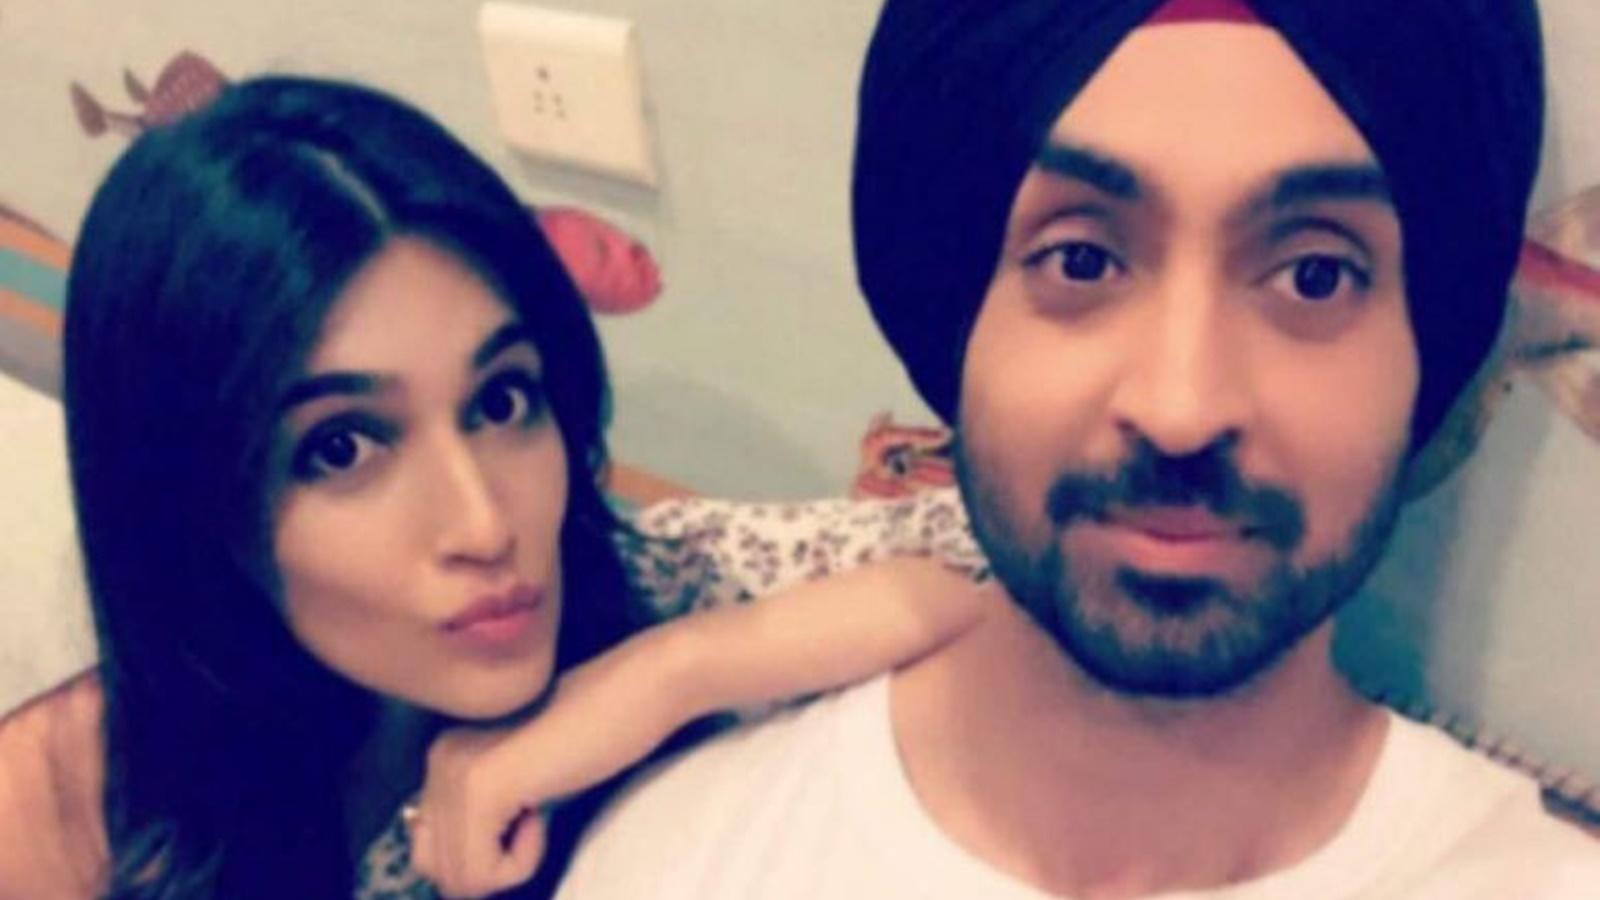 Kriti Sanon and Diljit Dosanjh's fun banter on the sets of 'Arjun Patiala' will leave you in splits!